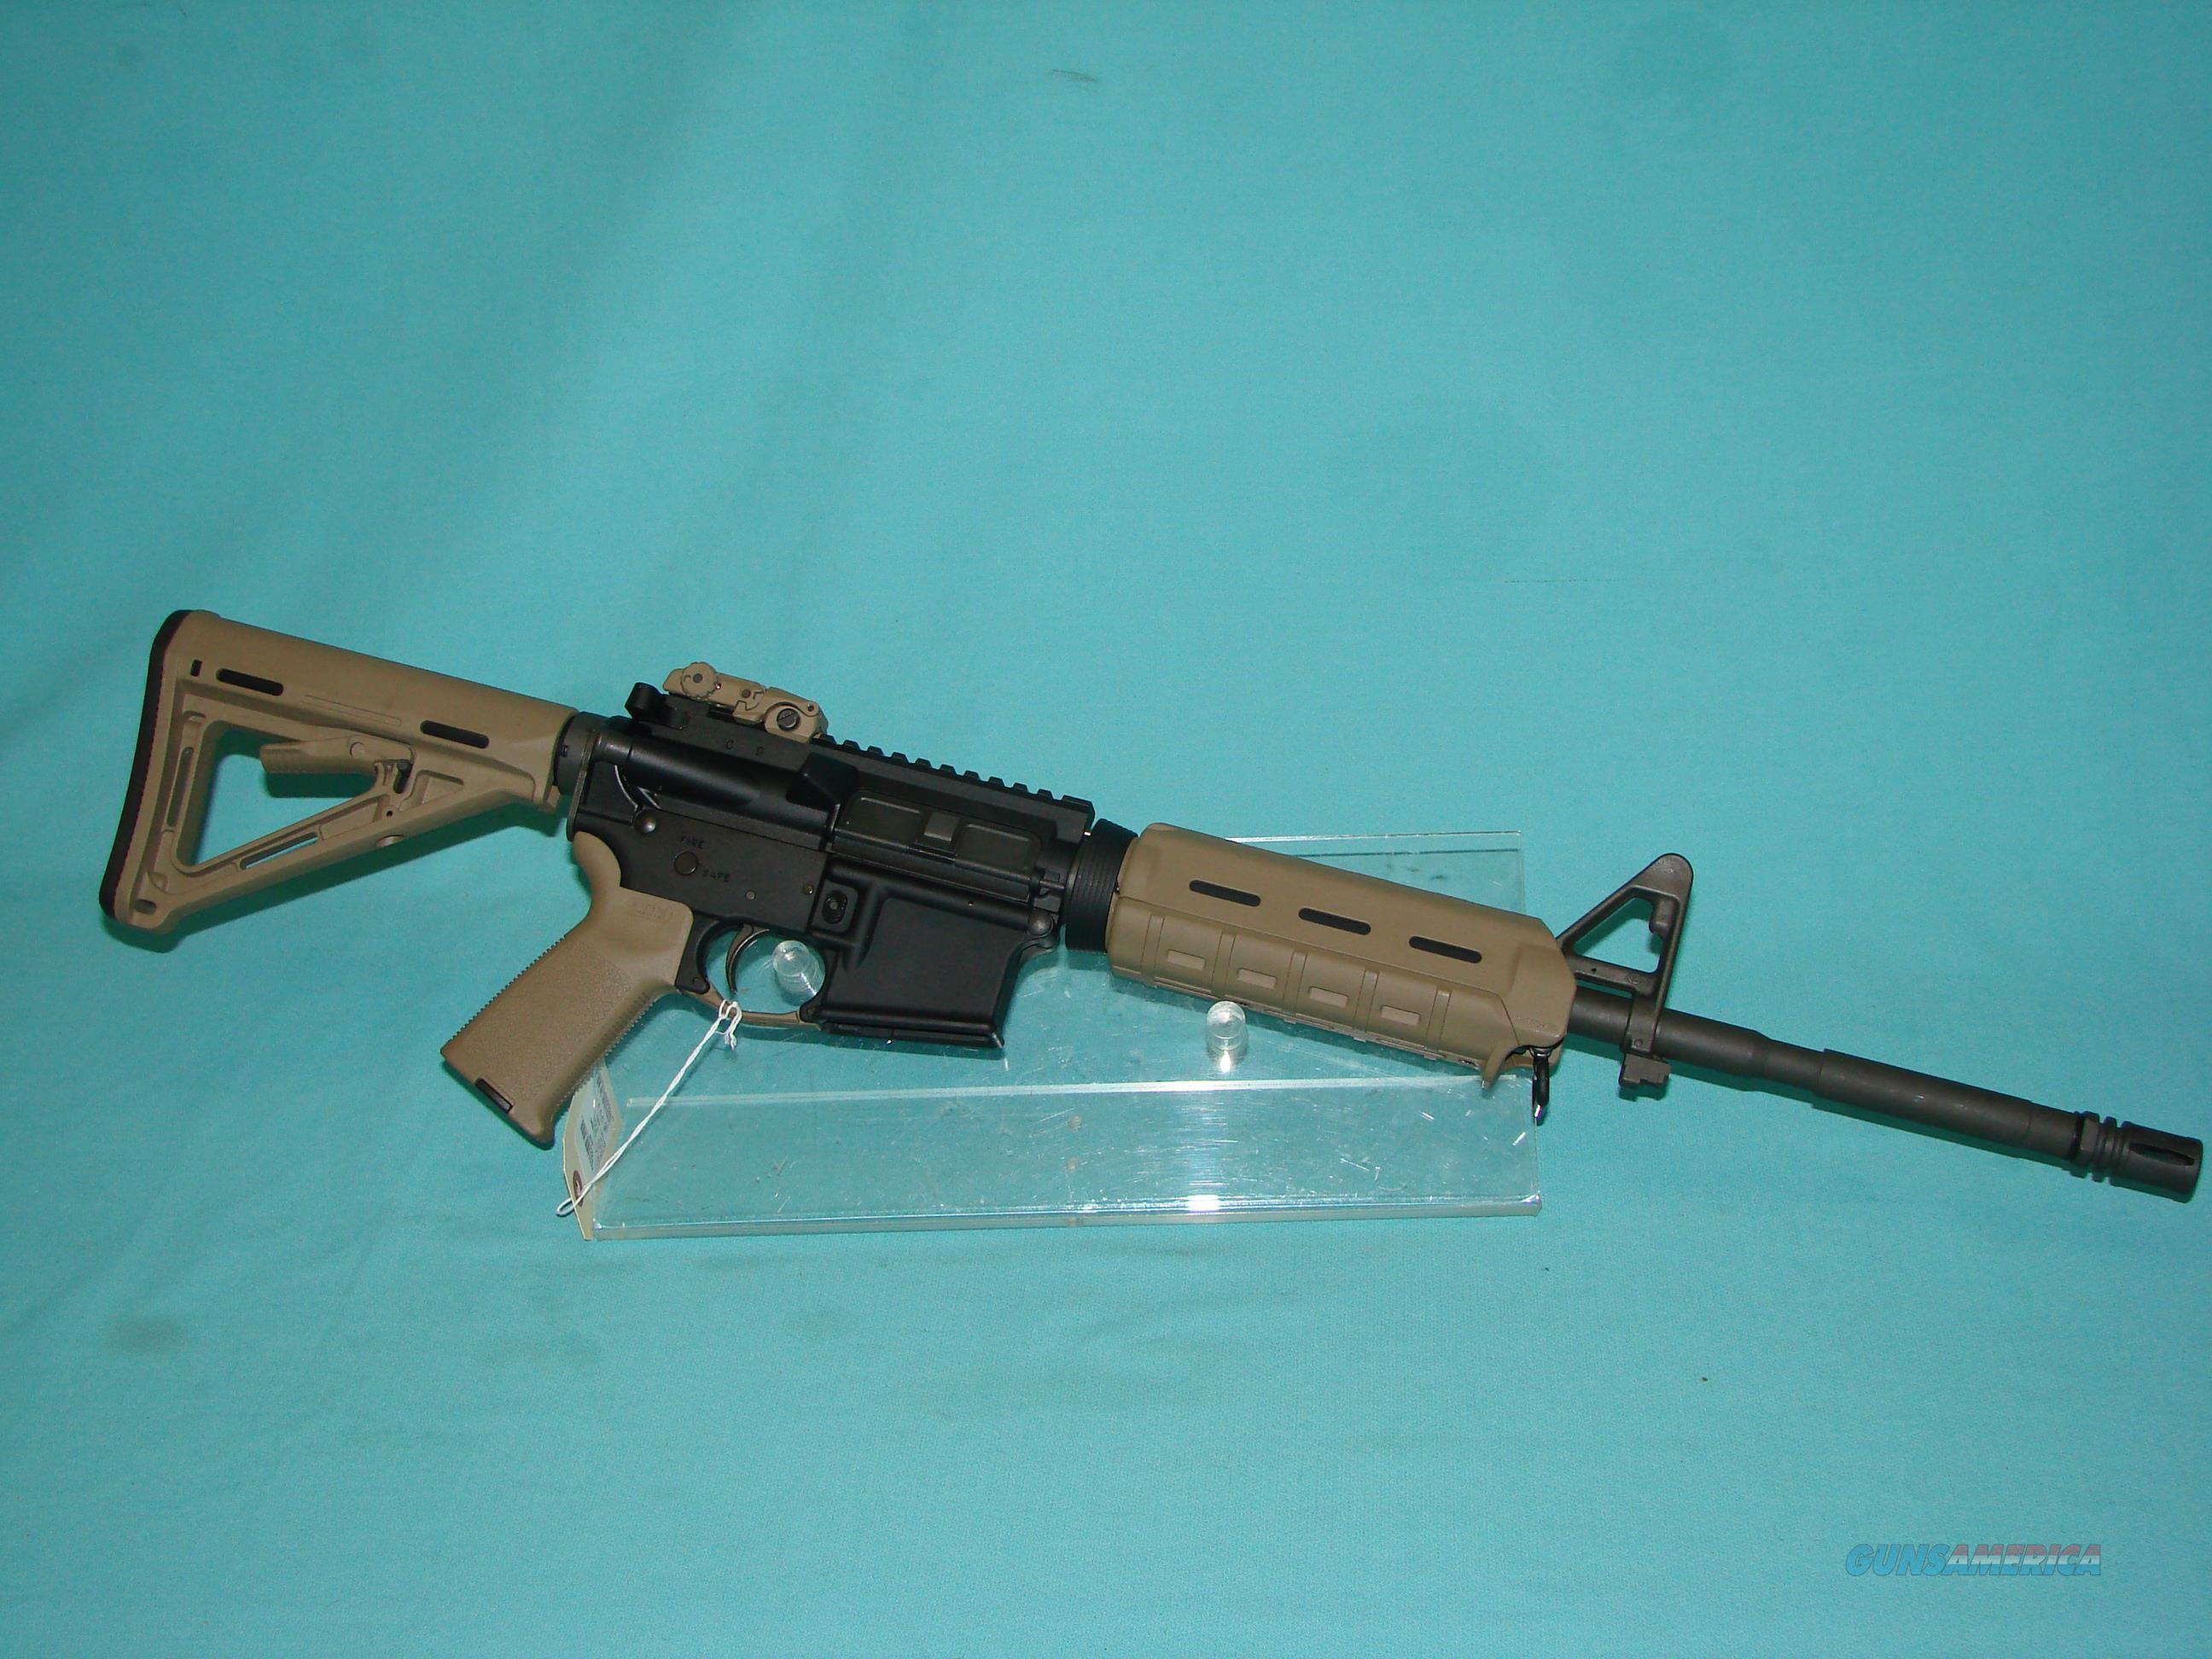 Colt M4 Carbine  Guns > Rifles > Colt Military/Tactical Rifles